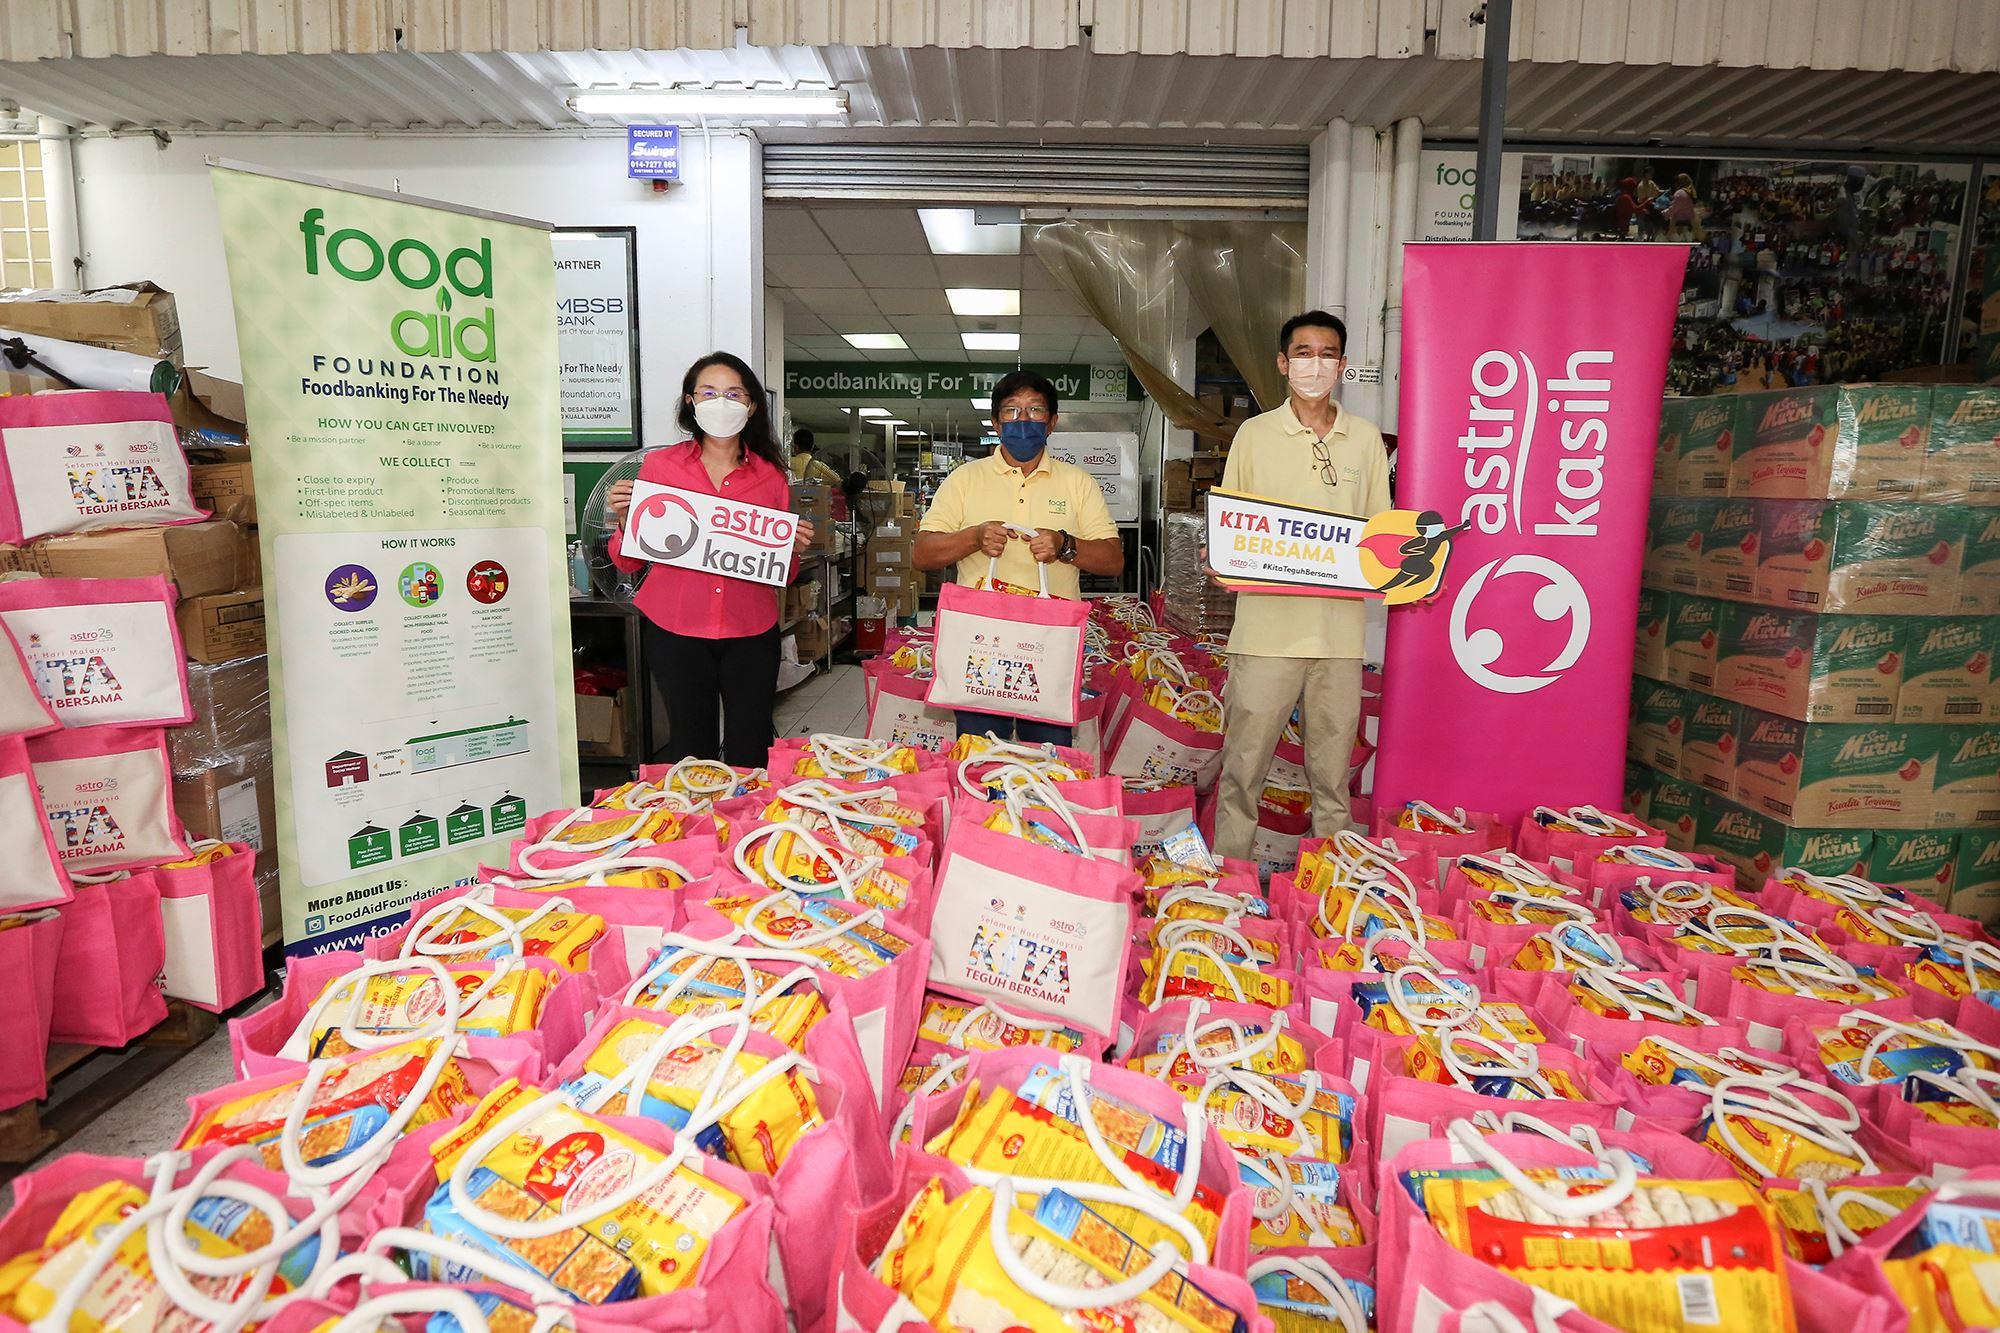 #kitateguhbersama: astro为800个有需要的家庭提供食品援助